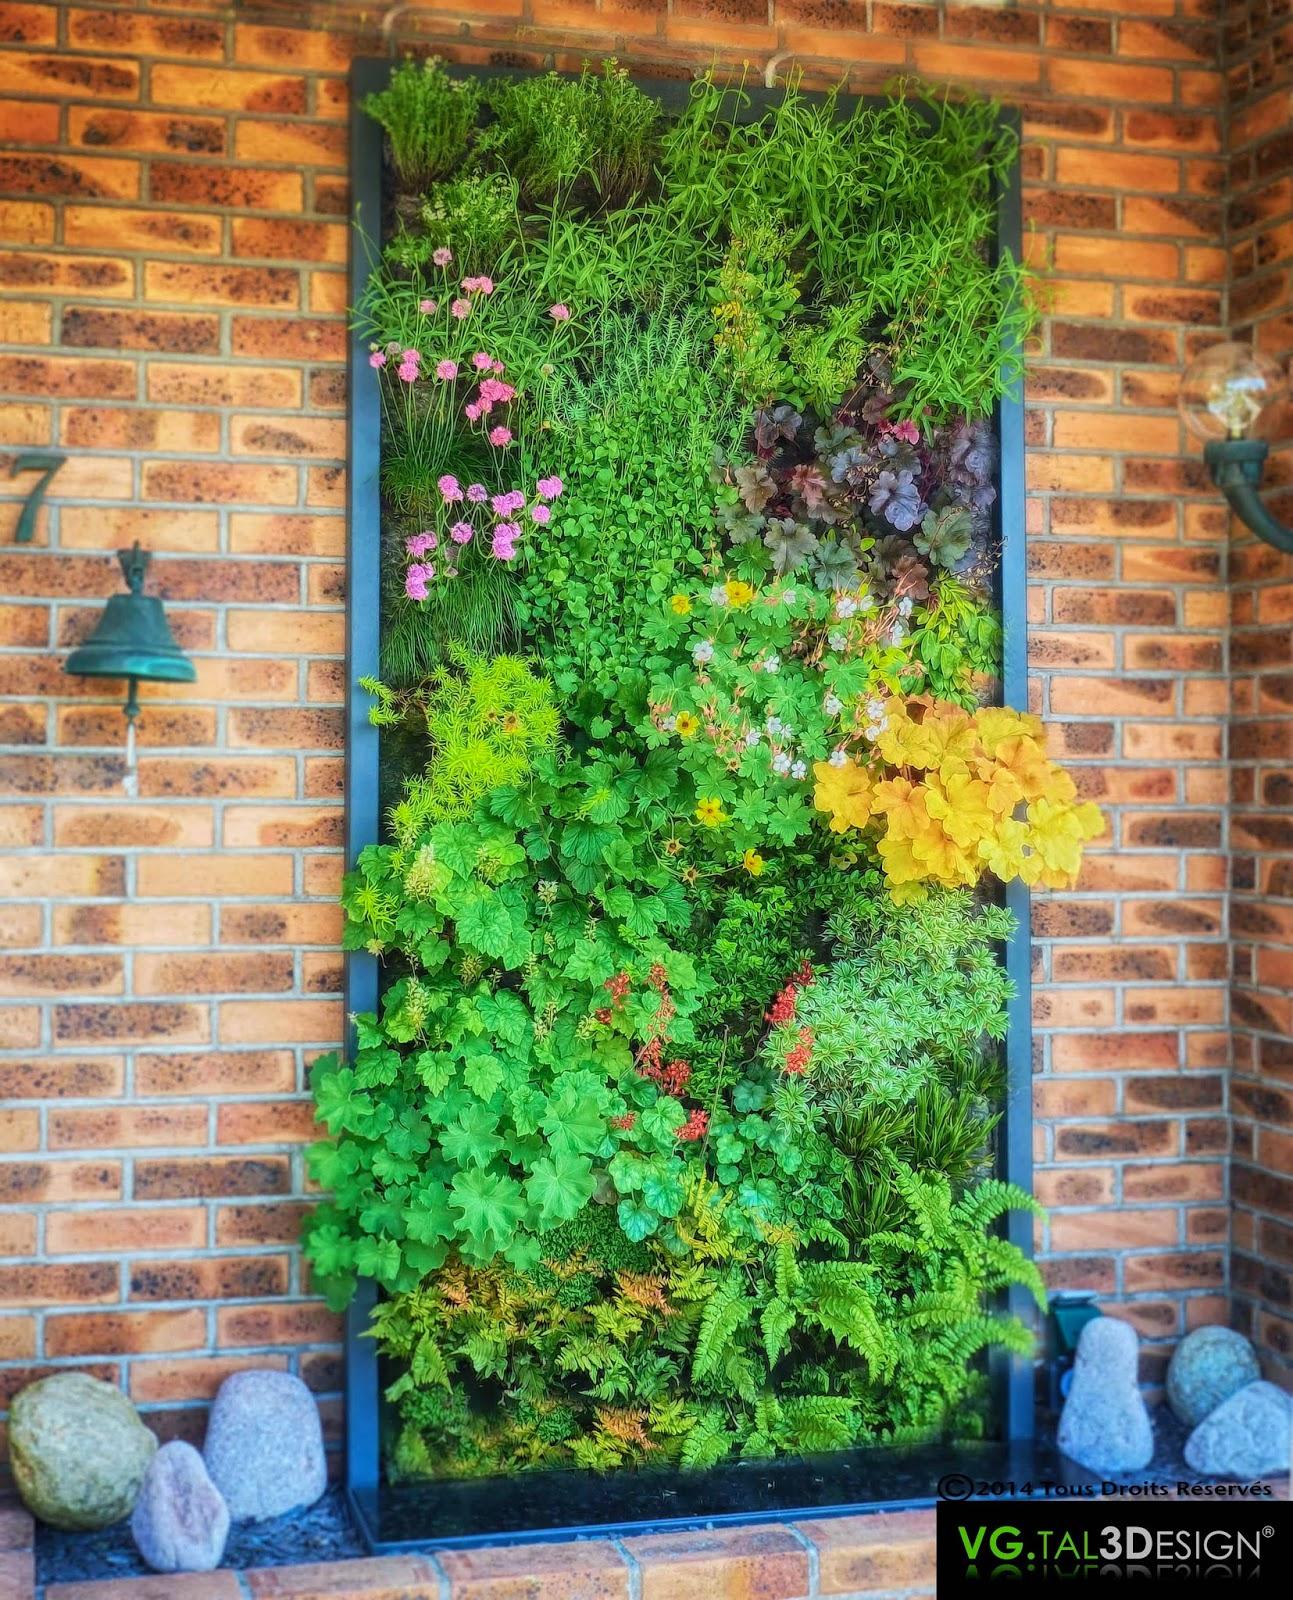 comment vegetaliser un mur exterieur stunning plantes mur vegetal exterieur porte plante mur. Black Bedroom Furniture Sets. Home Design Ideas